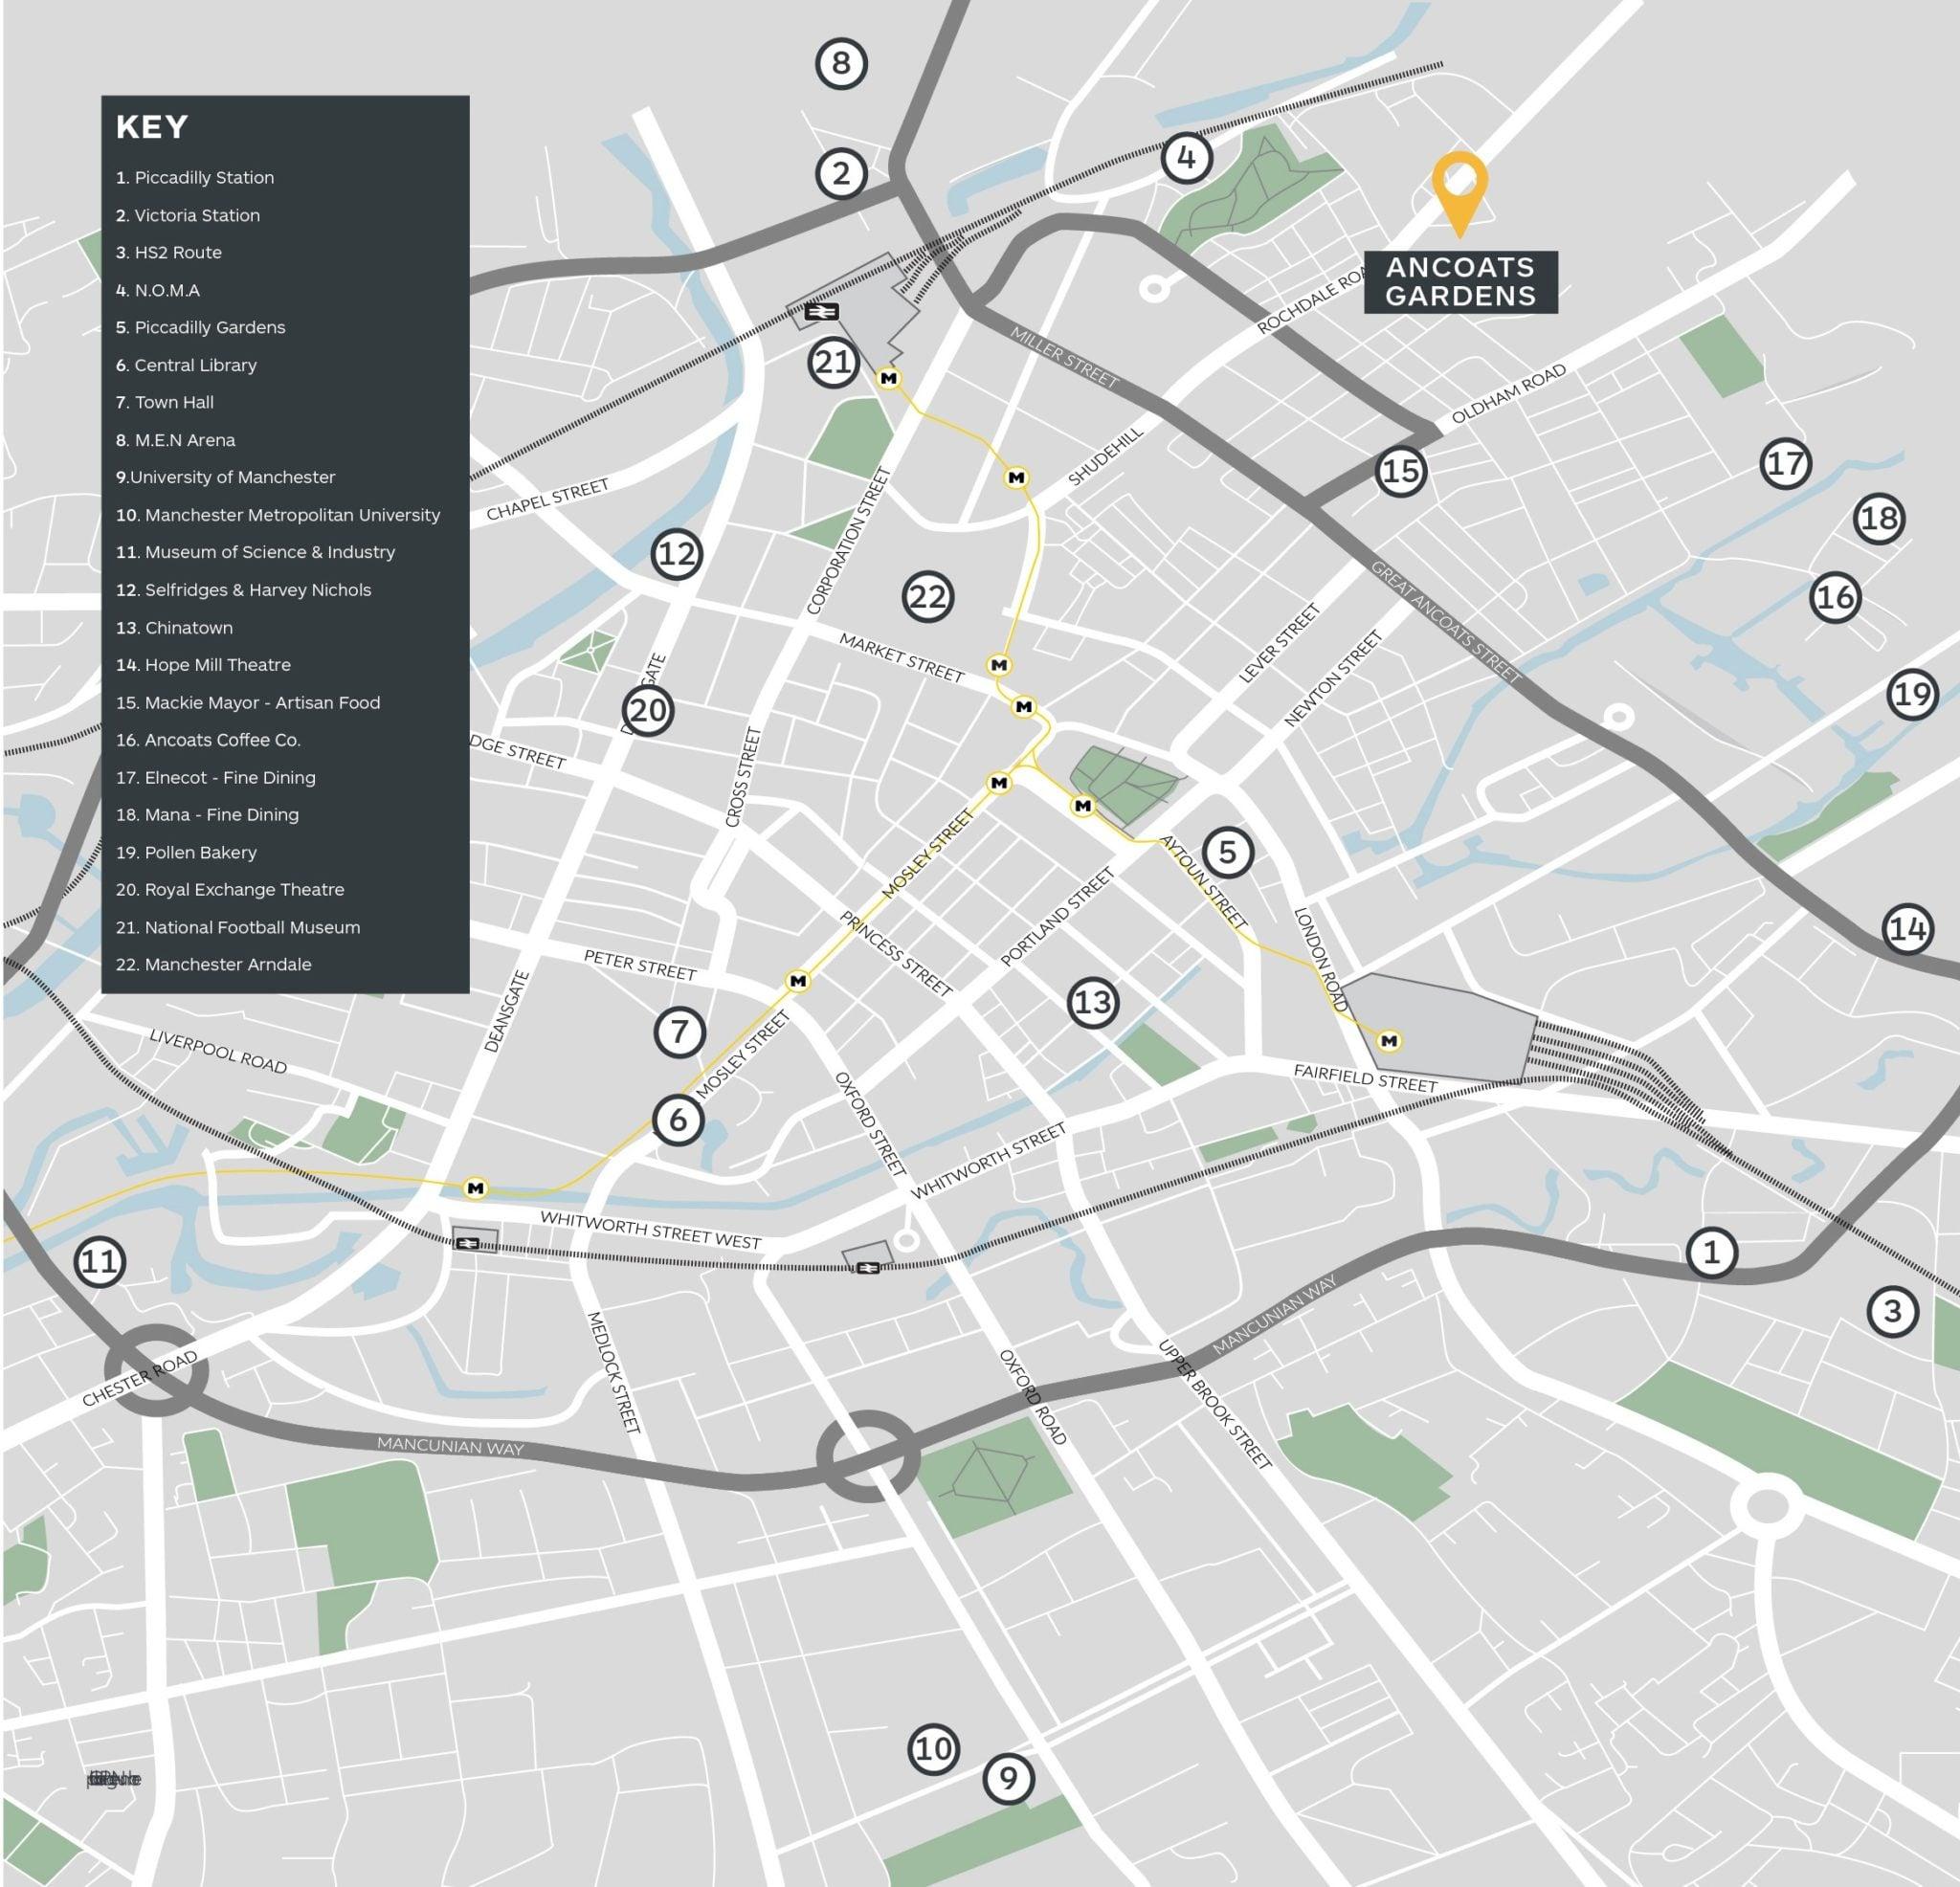 Ancoats-Gardens-map